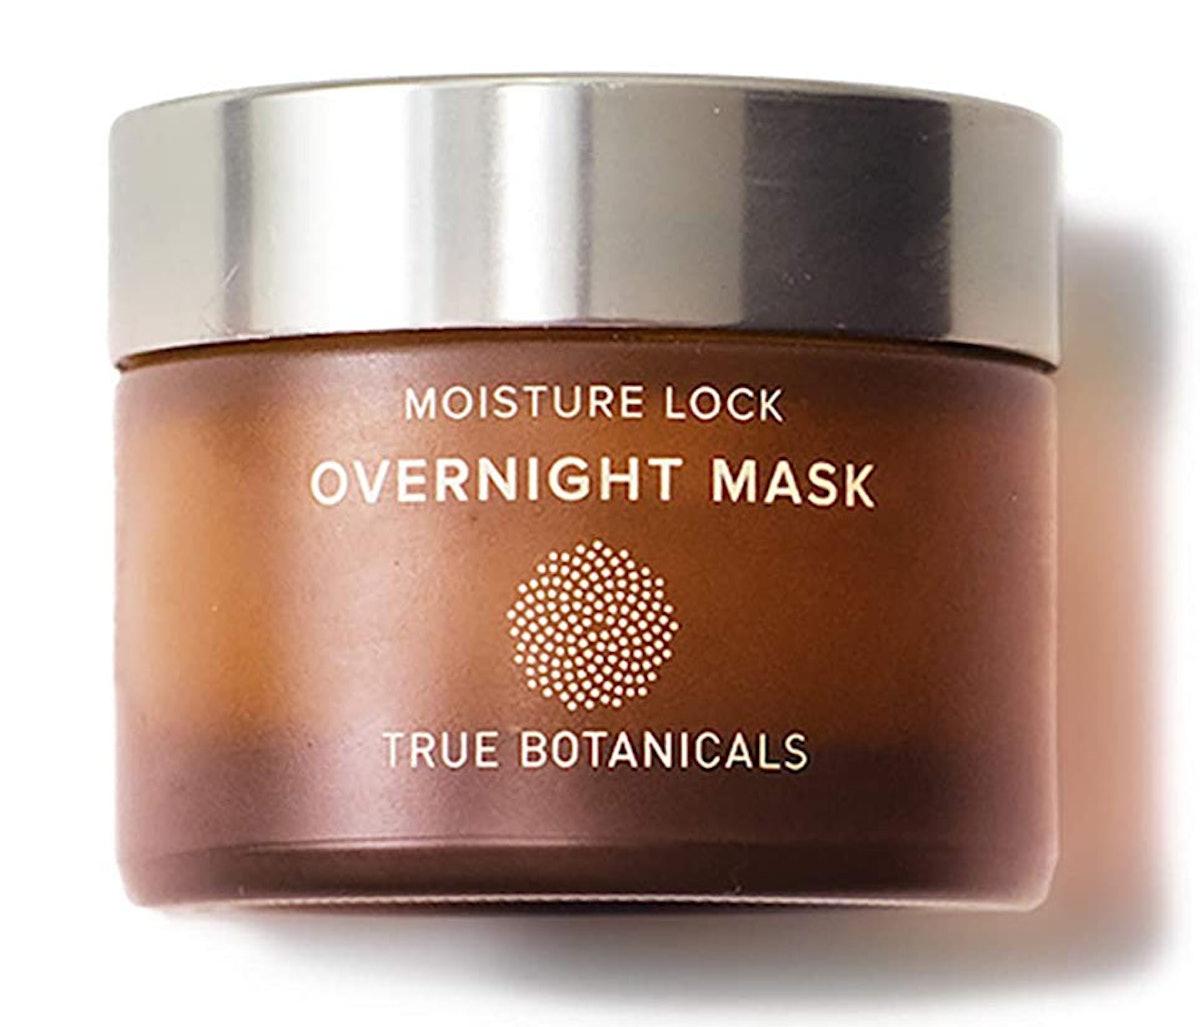 True Botanicals Moisture Lock Overnight Mask